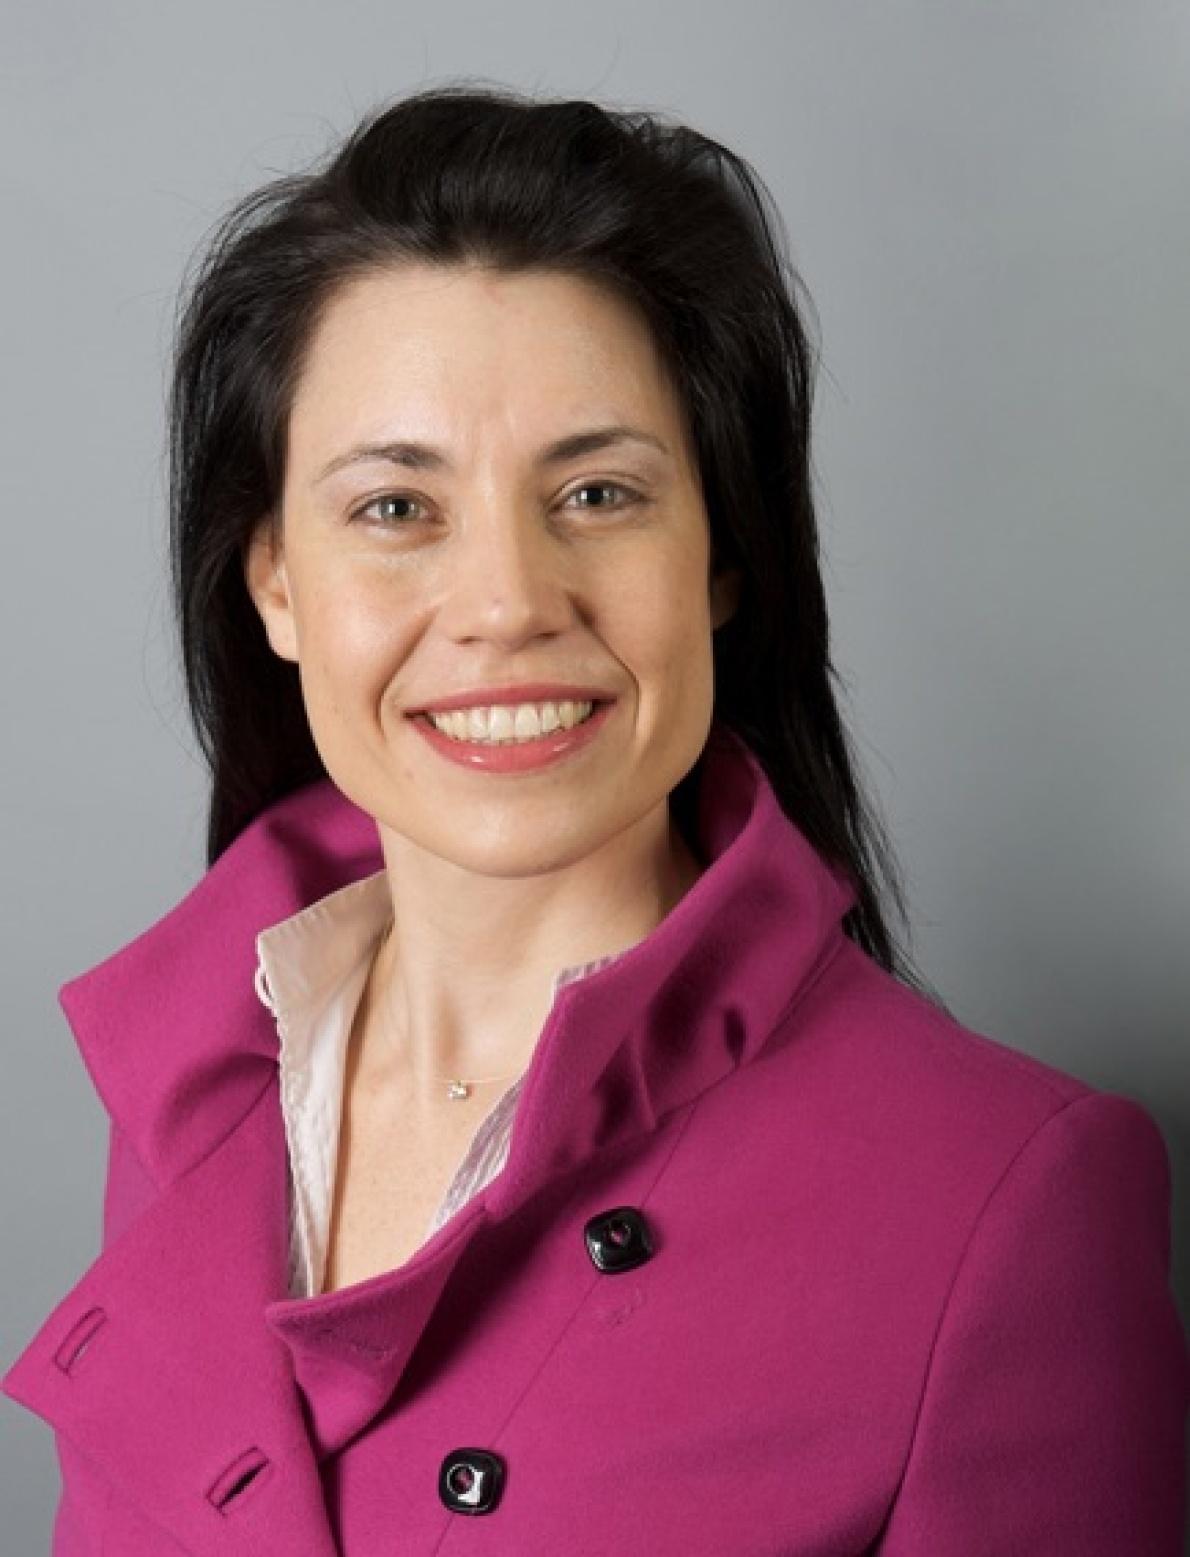 Karine Wittes